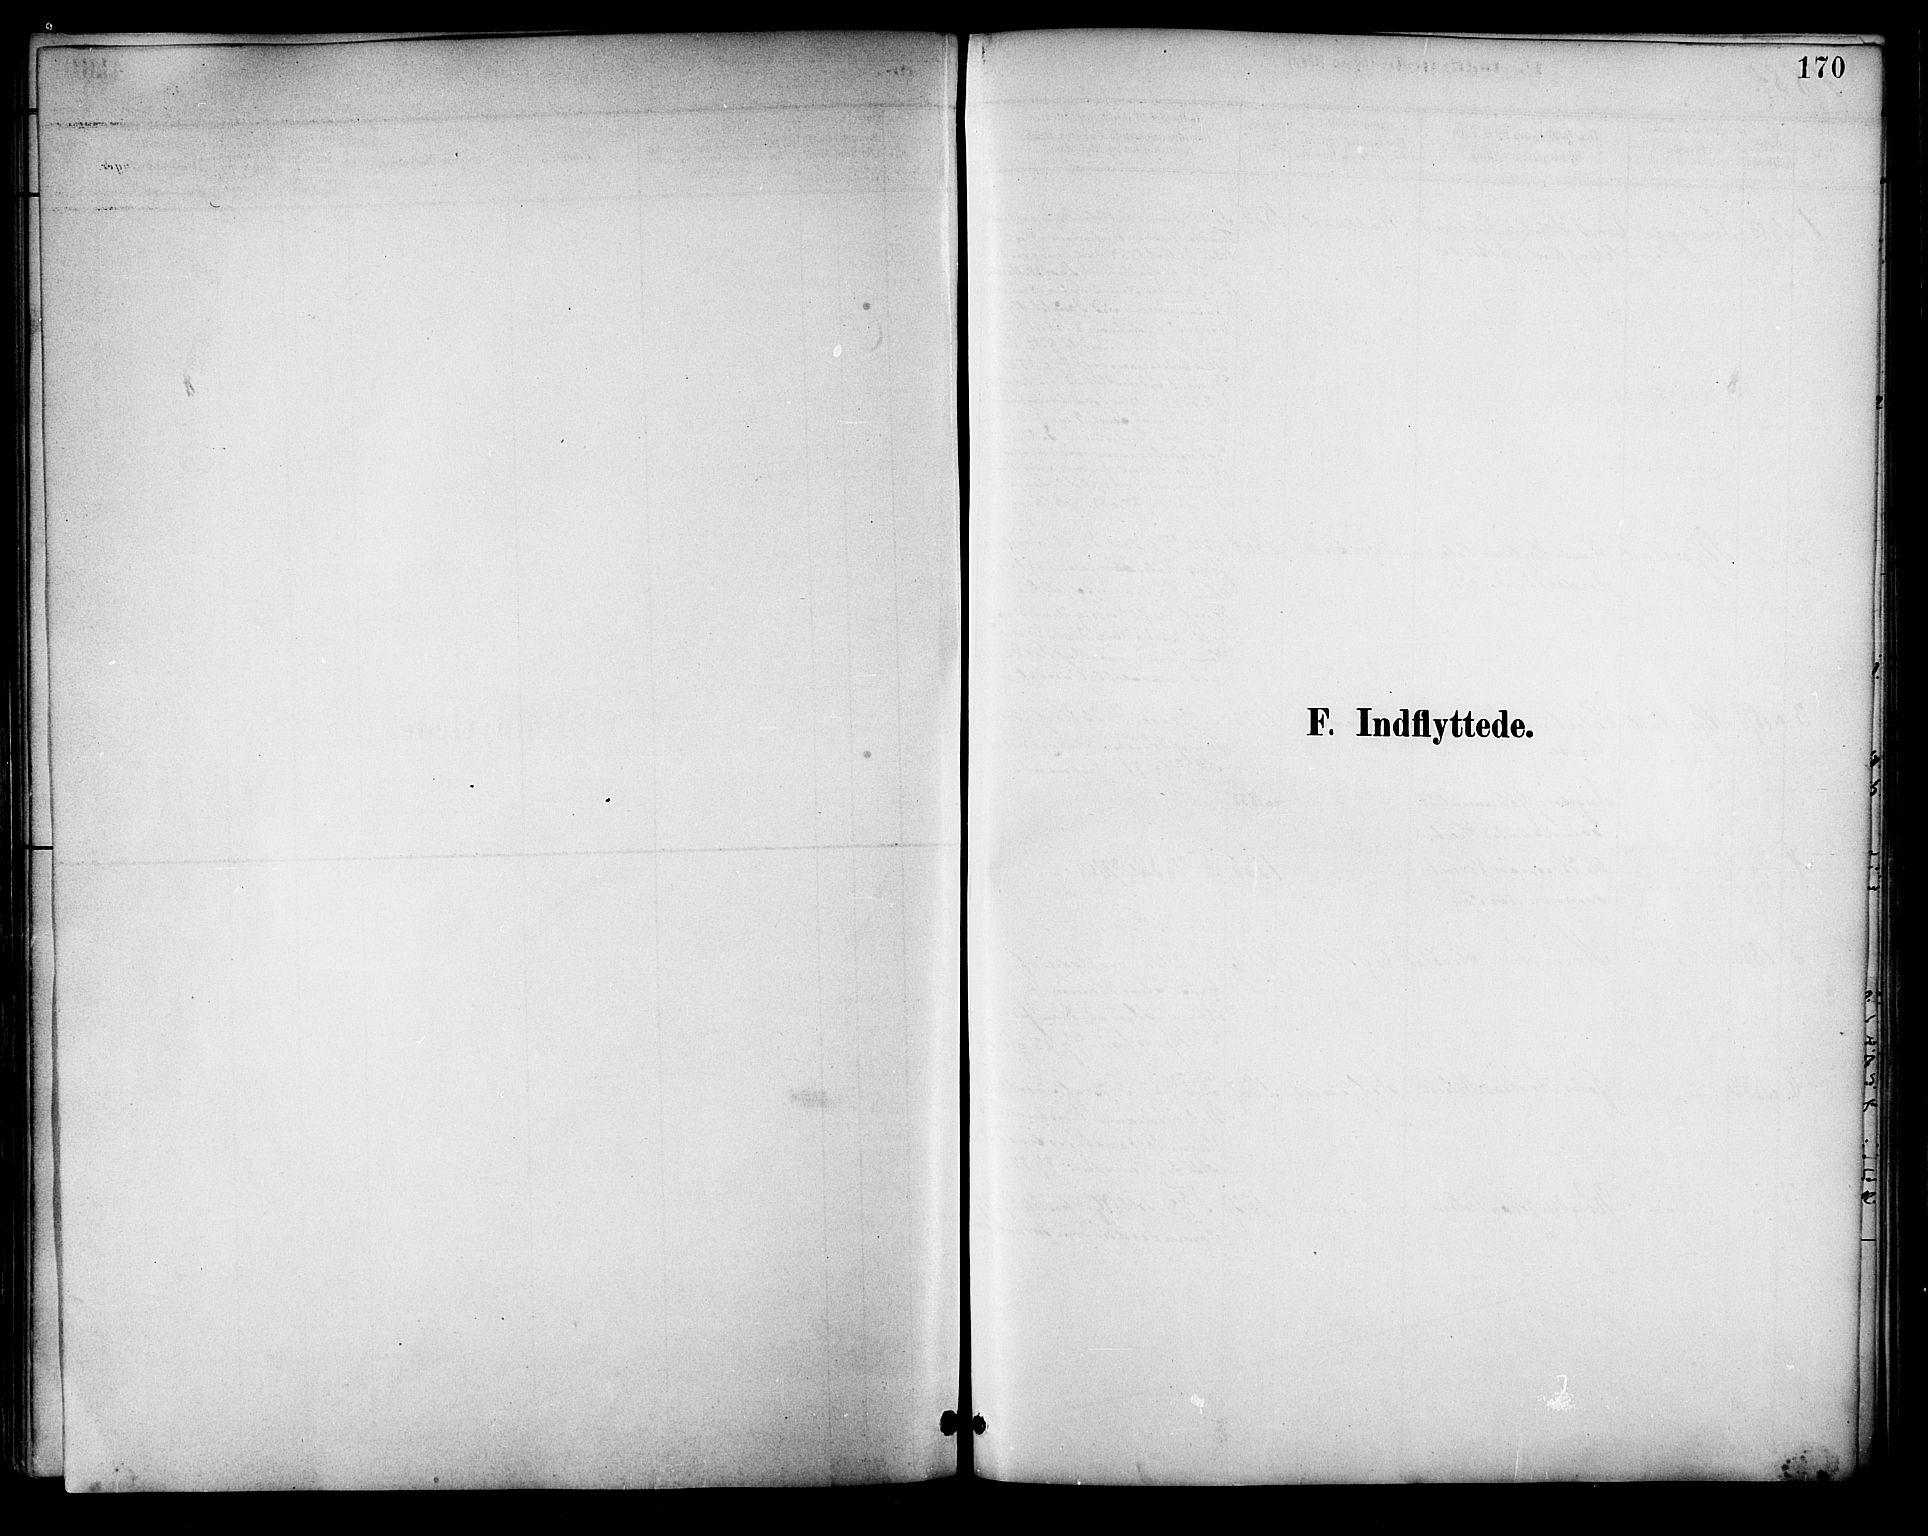 SAT, Ministerialprotokoller, klokkerbøker og fødselsregistre - Nordland, 854/L0777: Ministerialbok nr. 854A01 /1, 1883-1891, s. 170